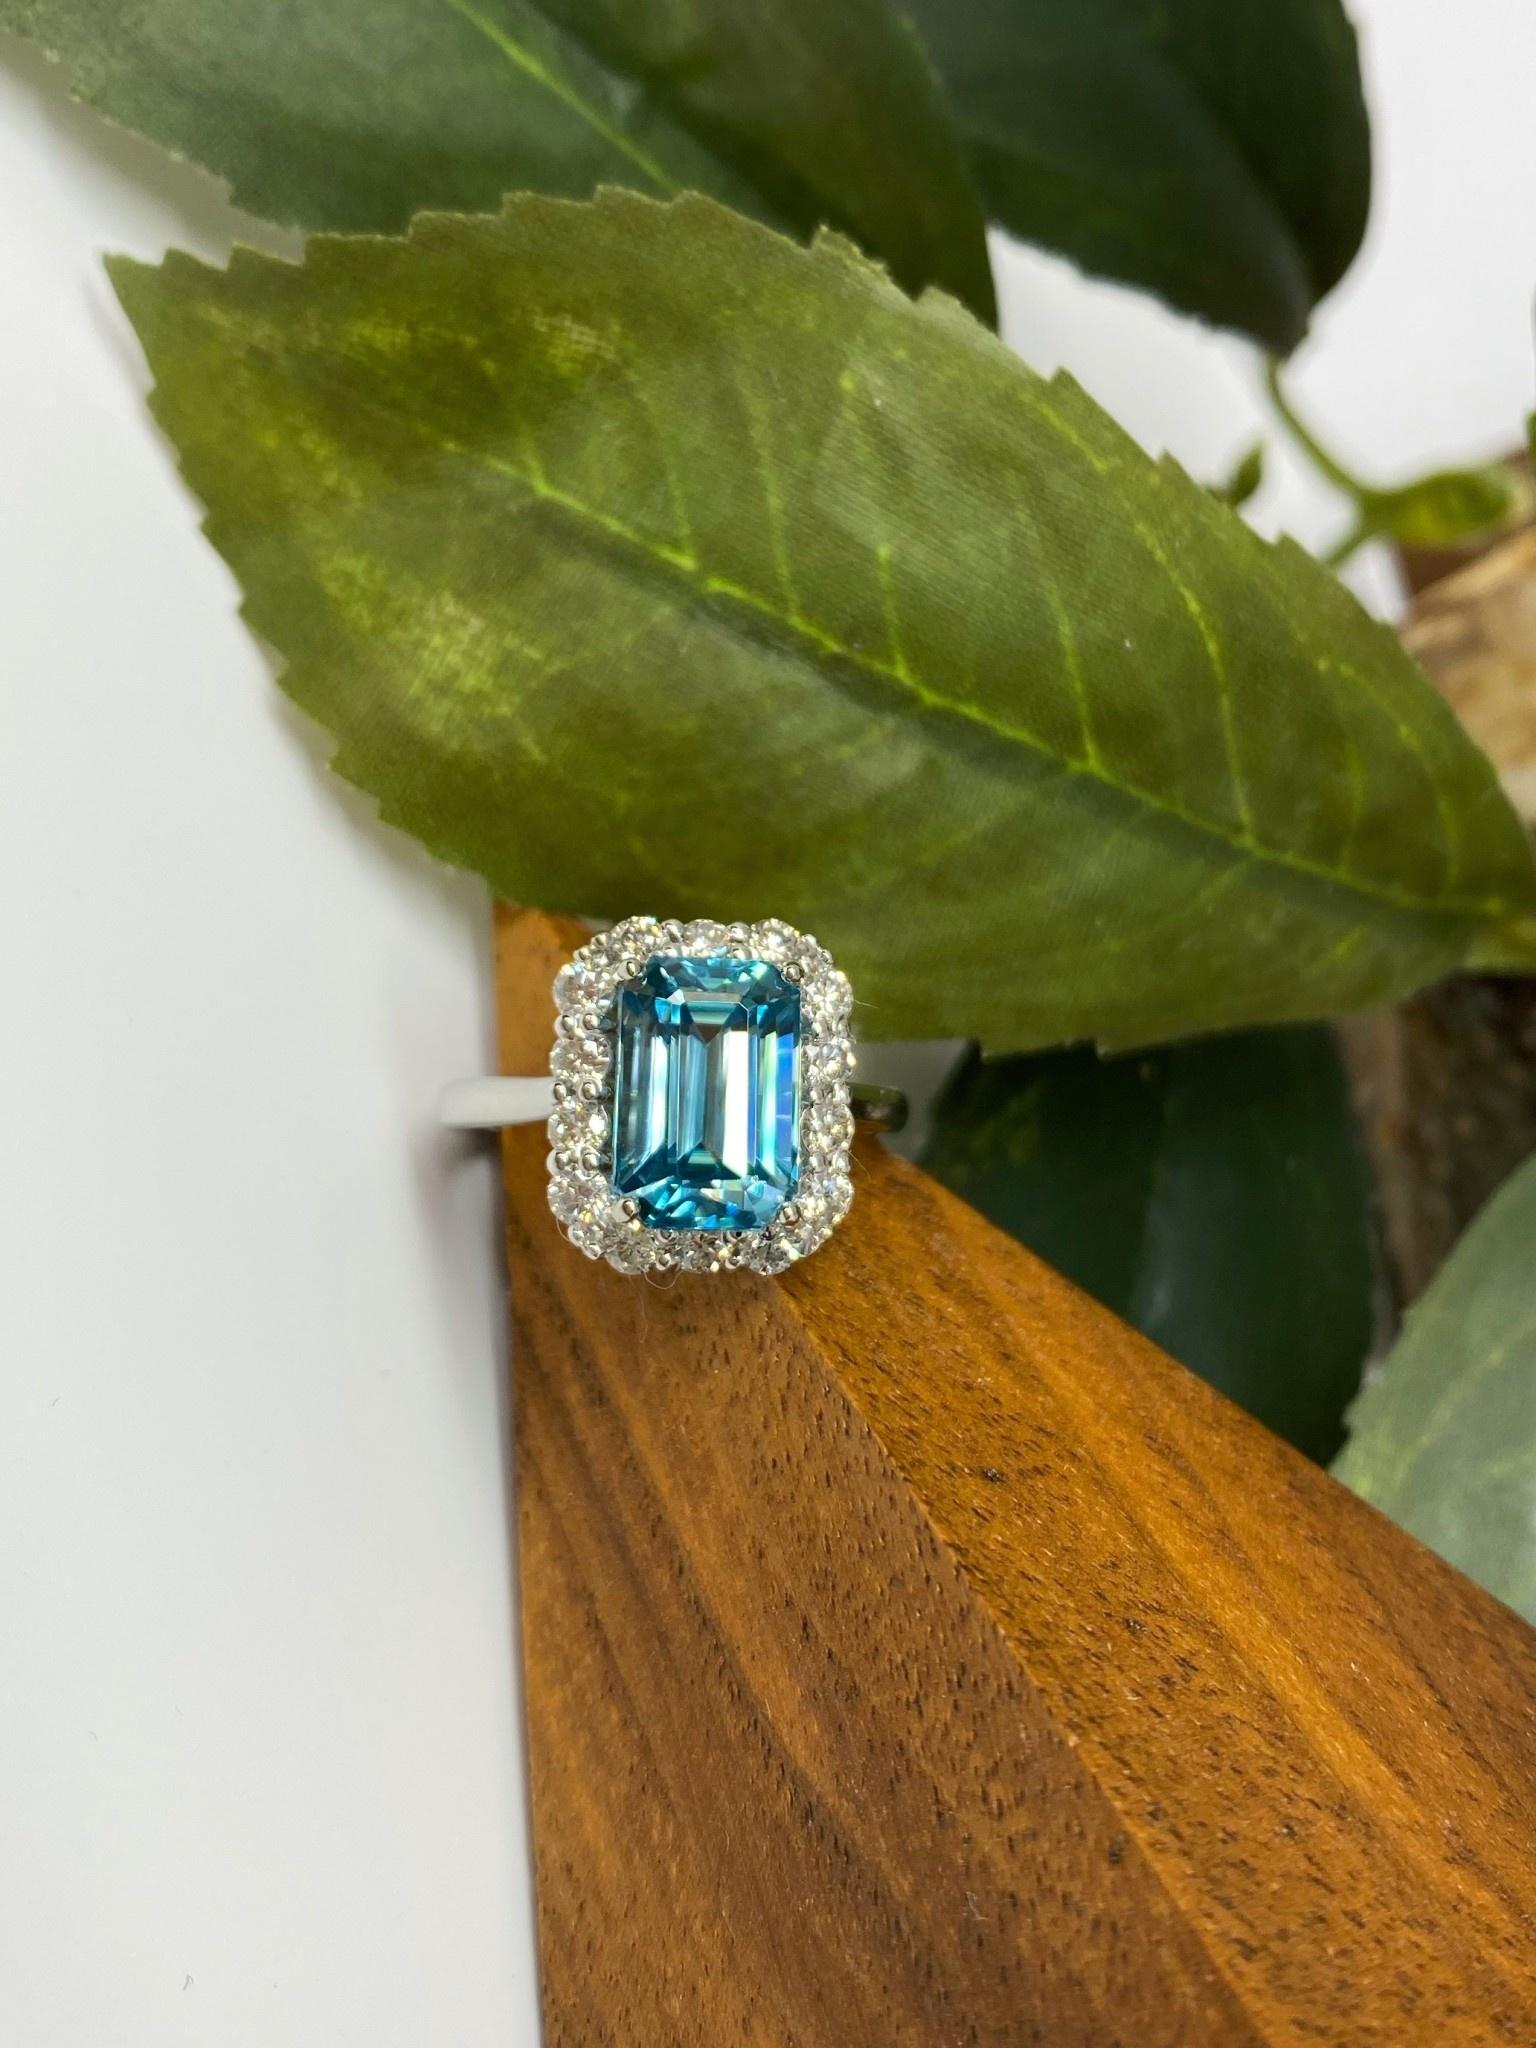 14K White Gold Emerald Cut Cambodia Blue Zircon and Diamond Ring